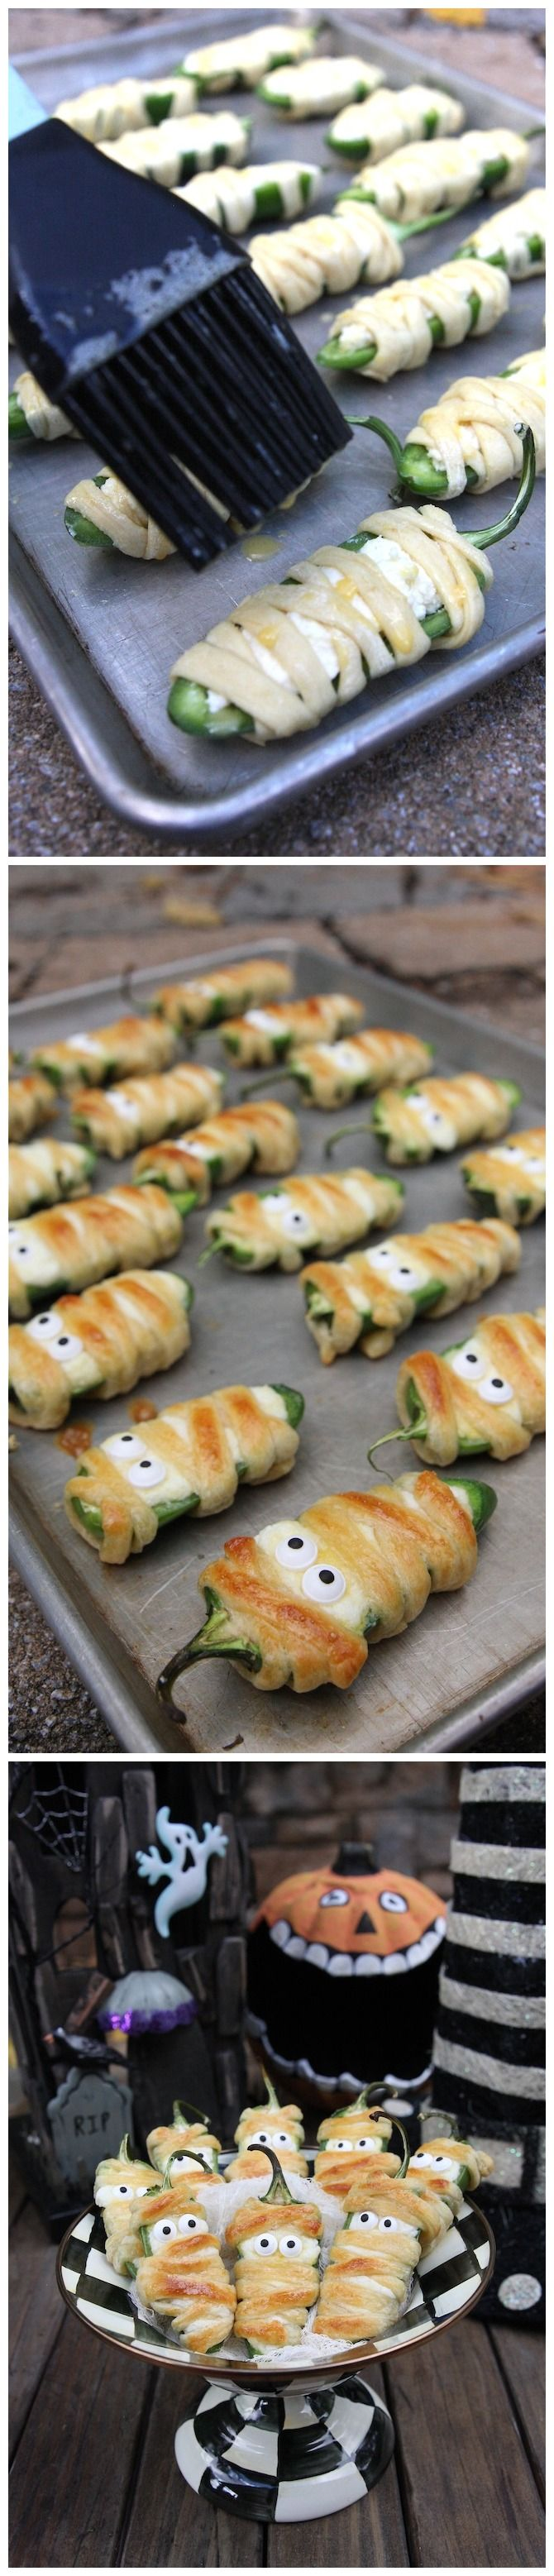 Best 25+ Halloween comida ideas on Pinterest | Alimentos fiesta de ...